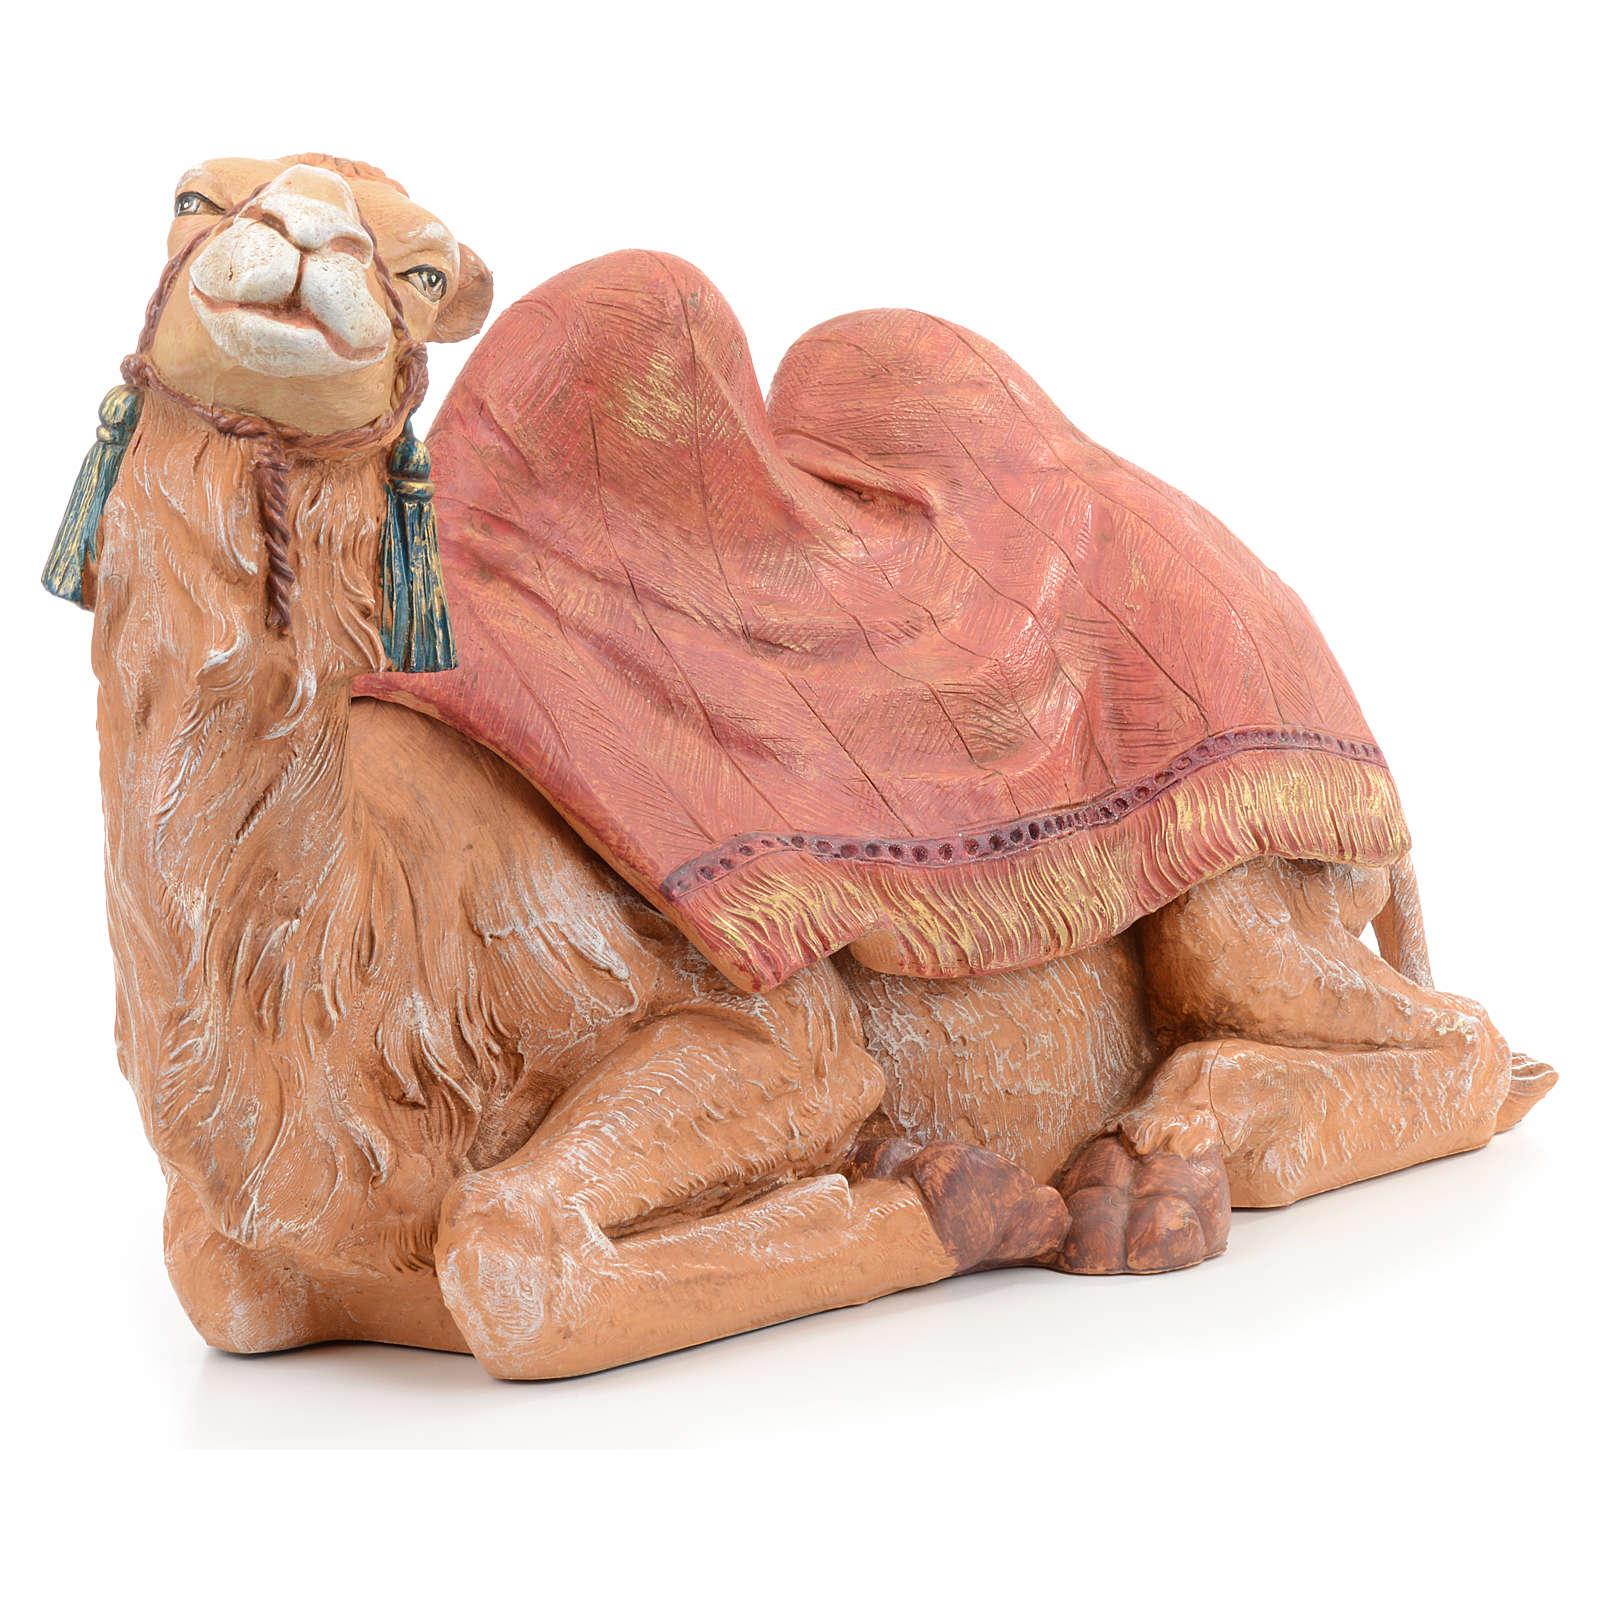 Cammello seduto sacca rossa Fontanini 45 cm 4